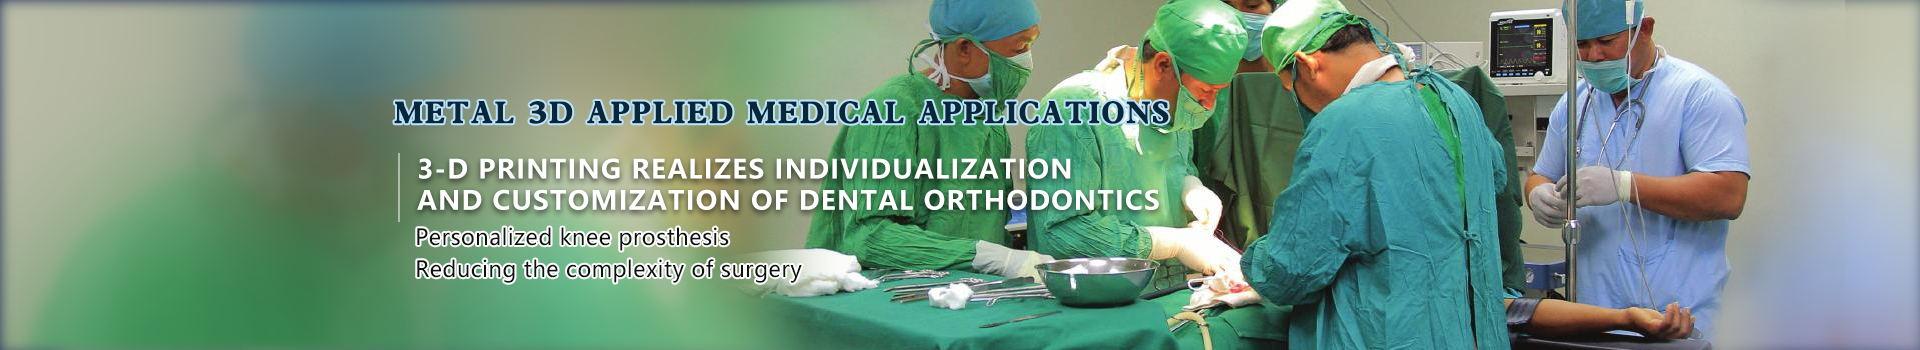 Medical oral application